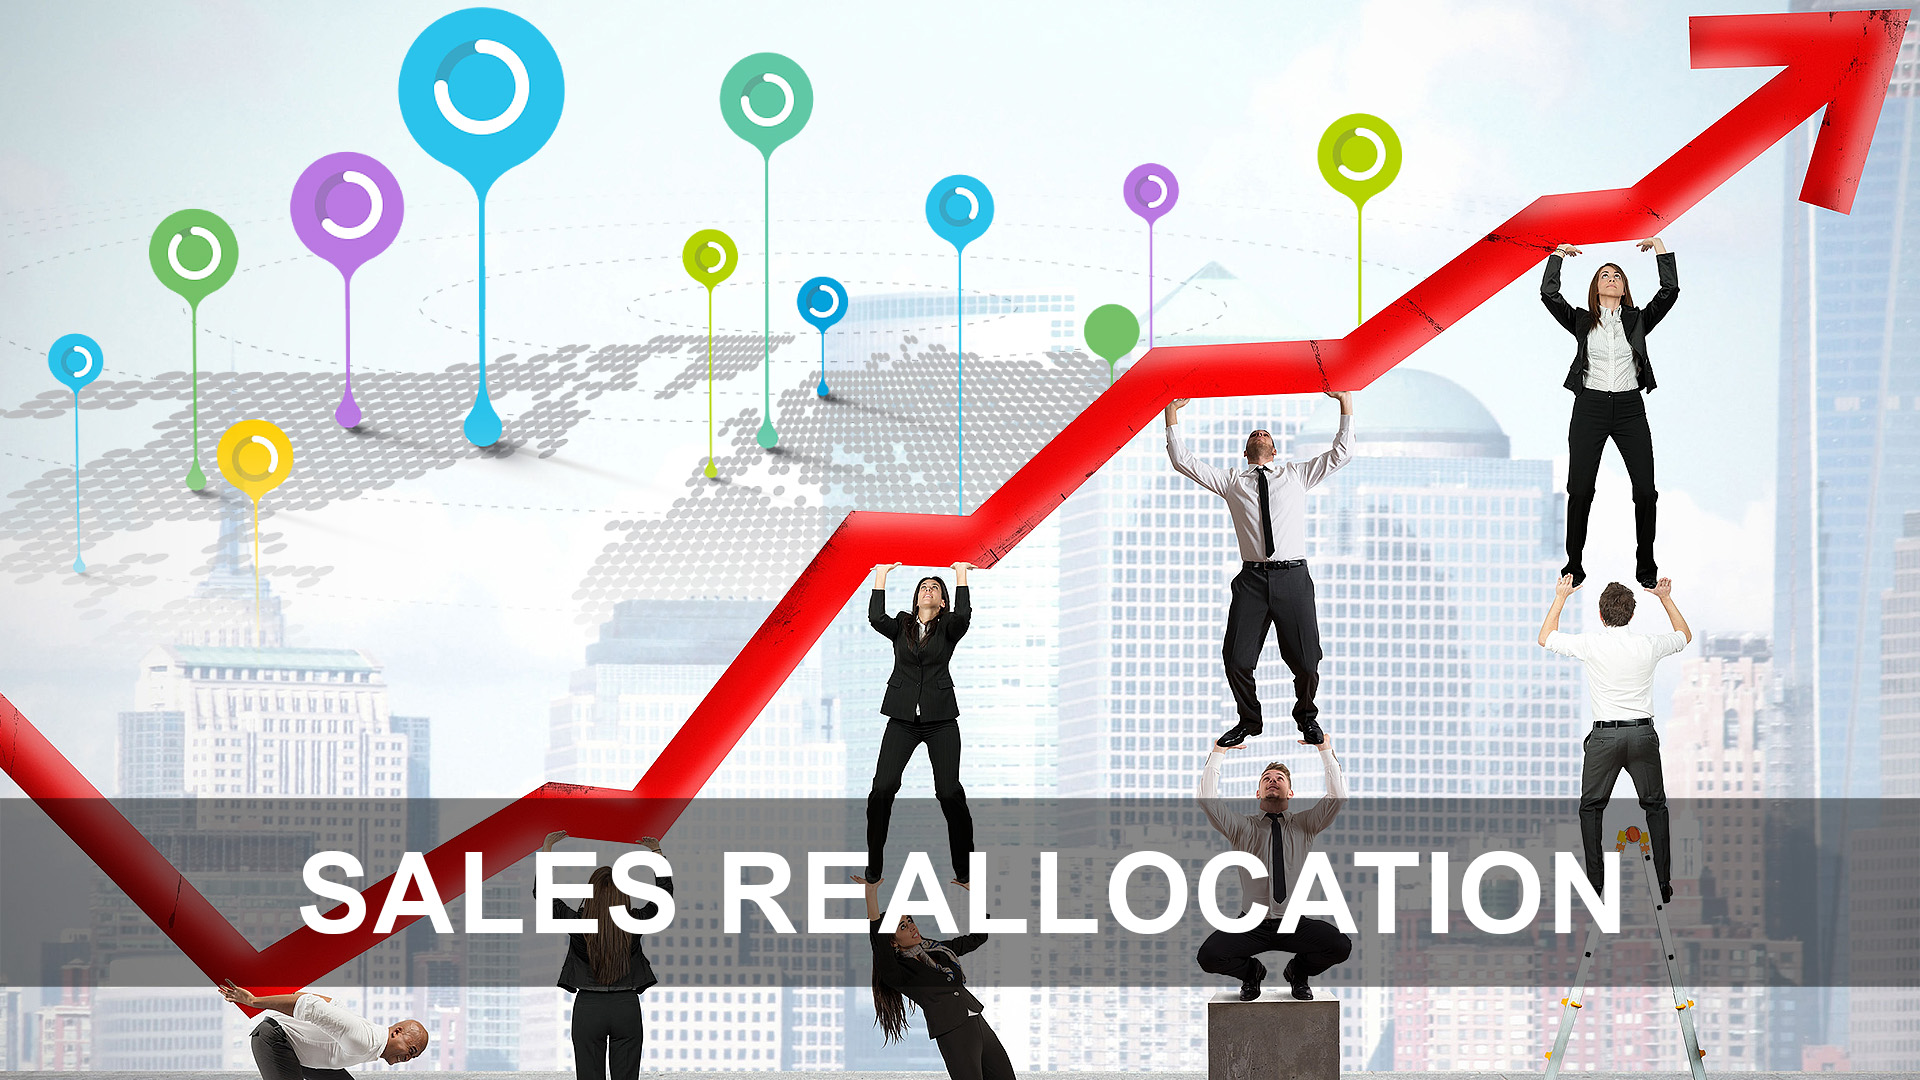 Sales Reallocation - KAM.jpg